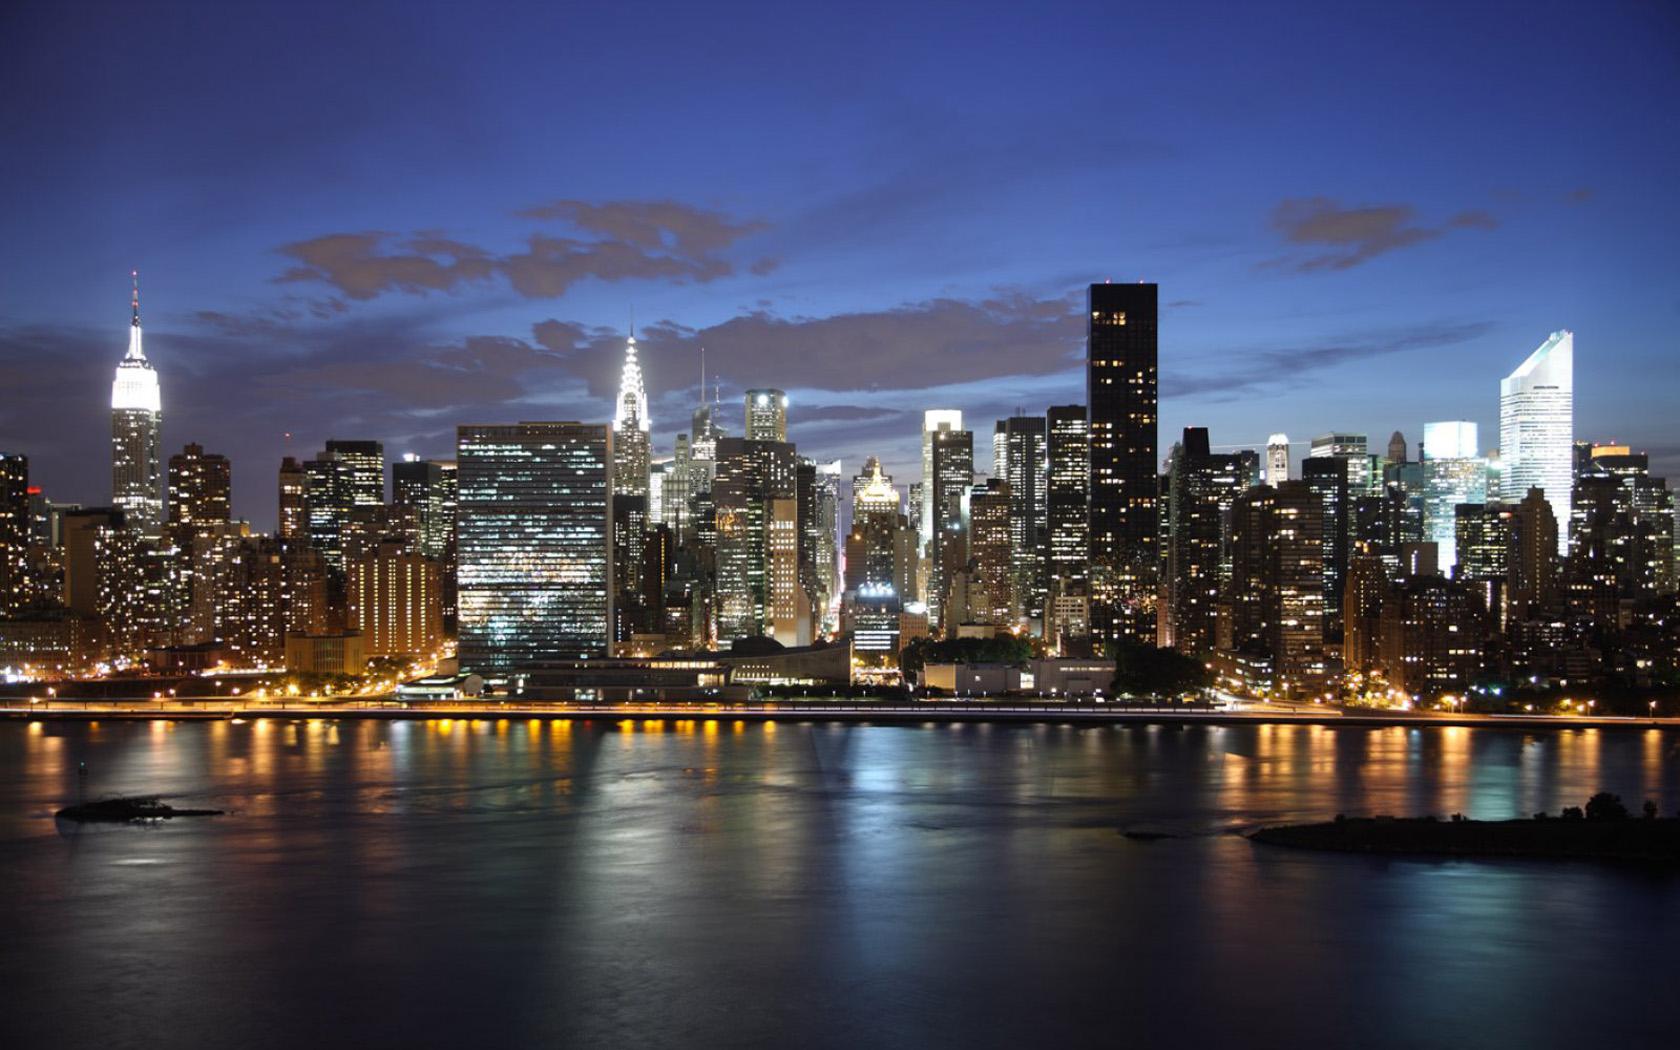 New York Skyline Night Hd 1680x1050 Wallpaper Teahub Io